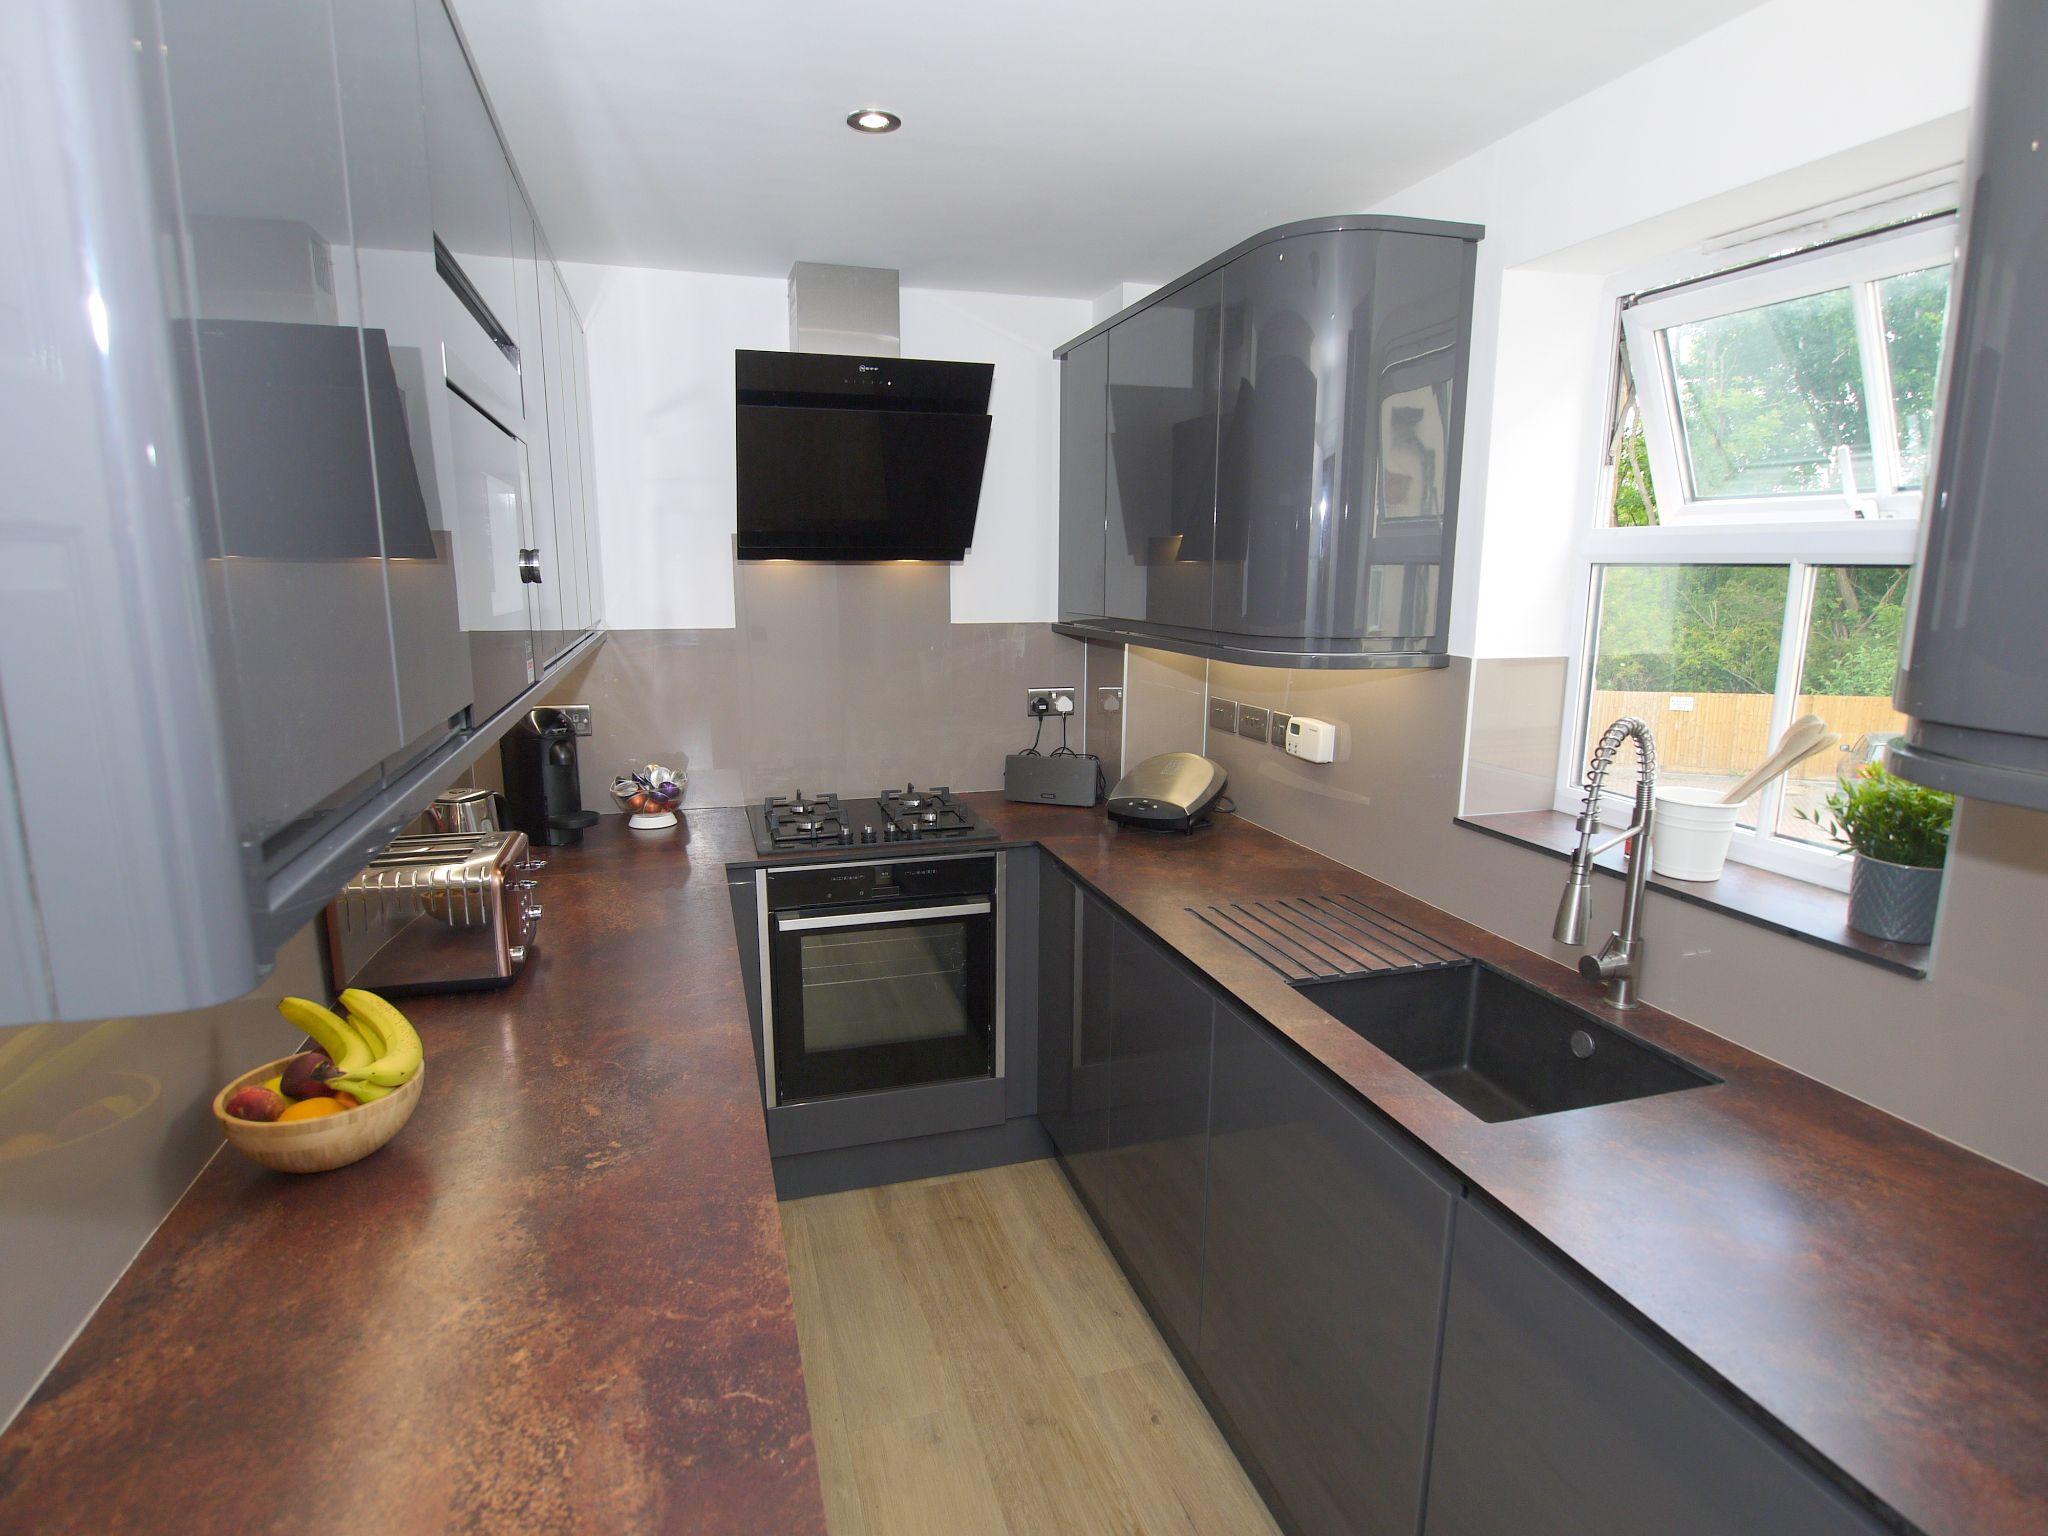 2 bedroom apartment flat/apartment For Sale in Sevenoaks - Photograph 4